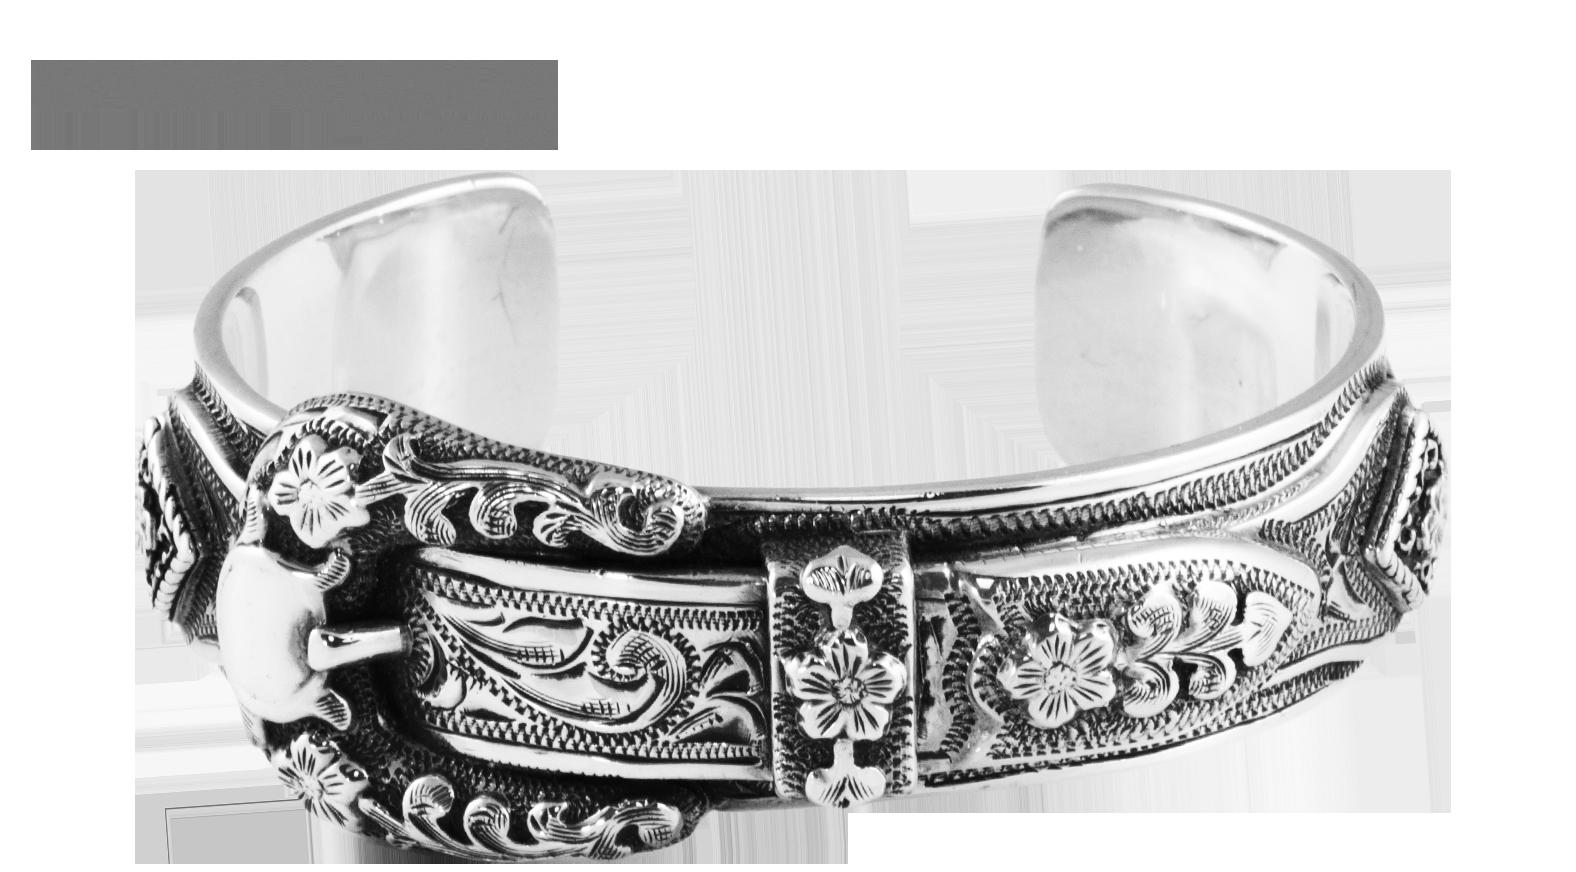 Buckle Cuff Bracelet